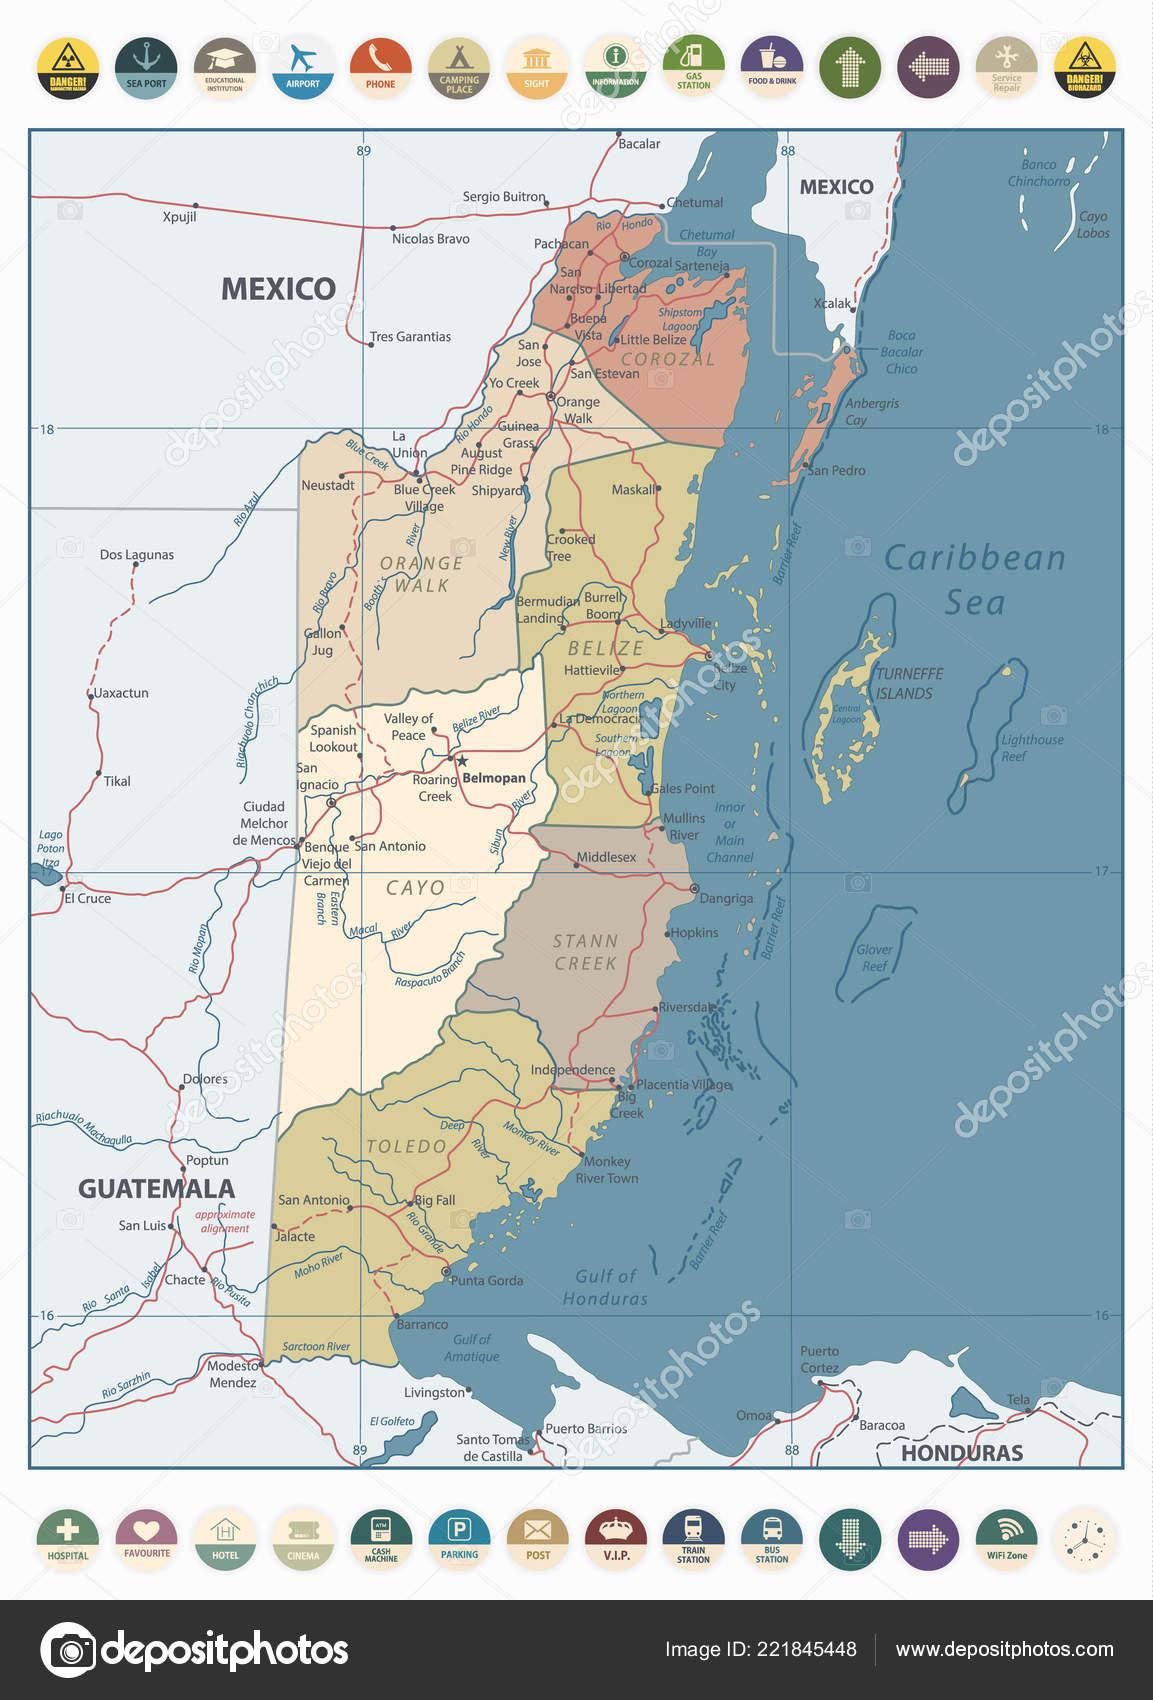 Belize Vintage Color Map Flat Icons Detailed Political Map Belize Stock Vector C Livenart 221845448